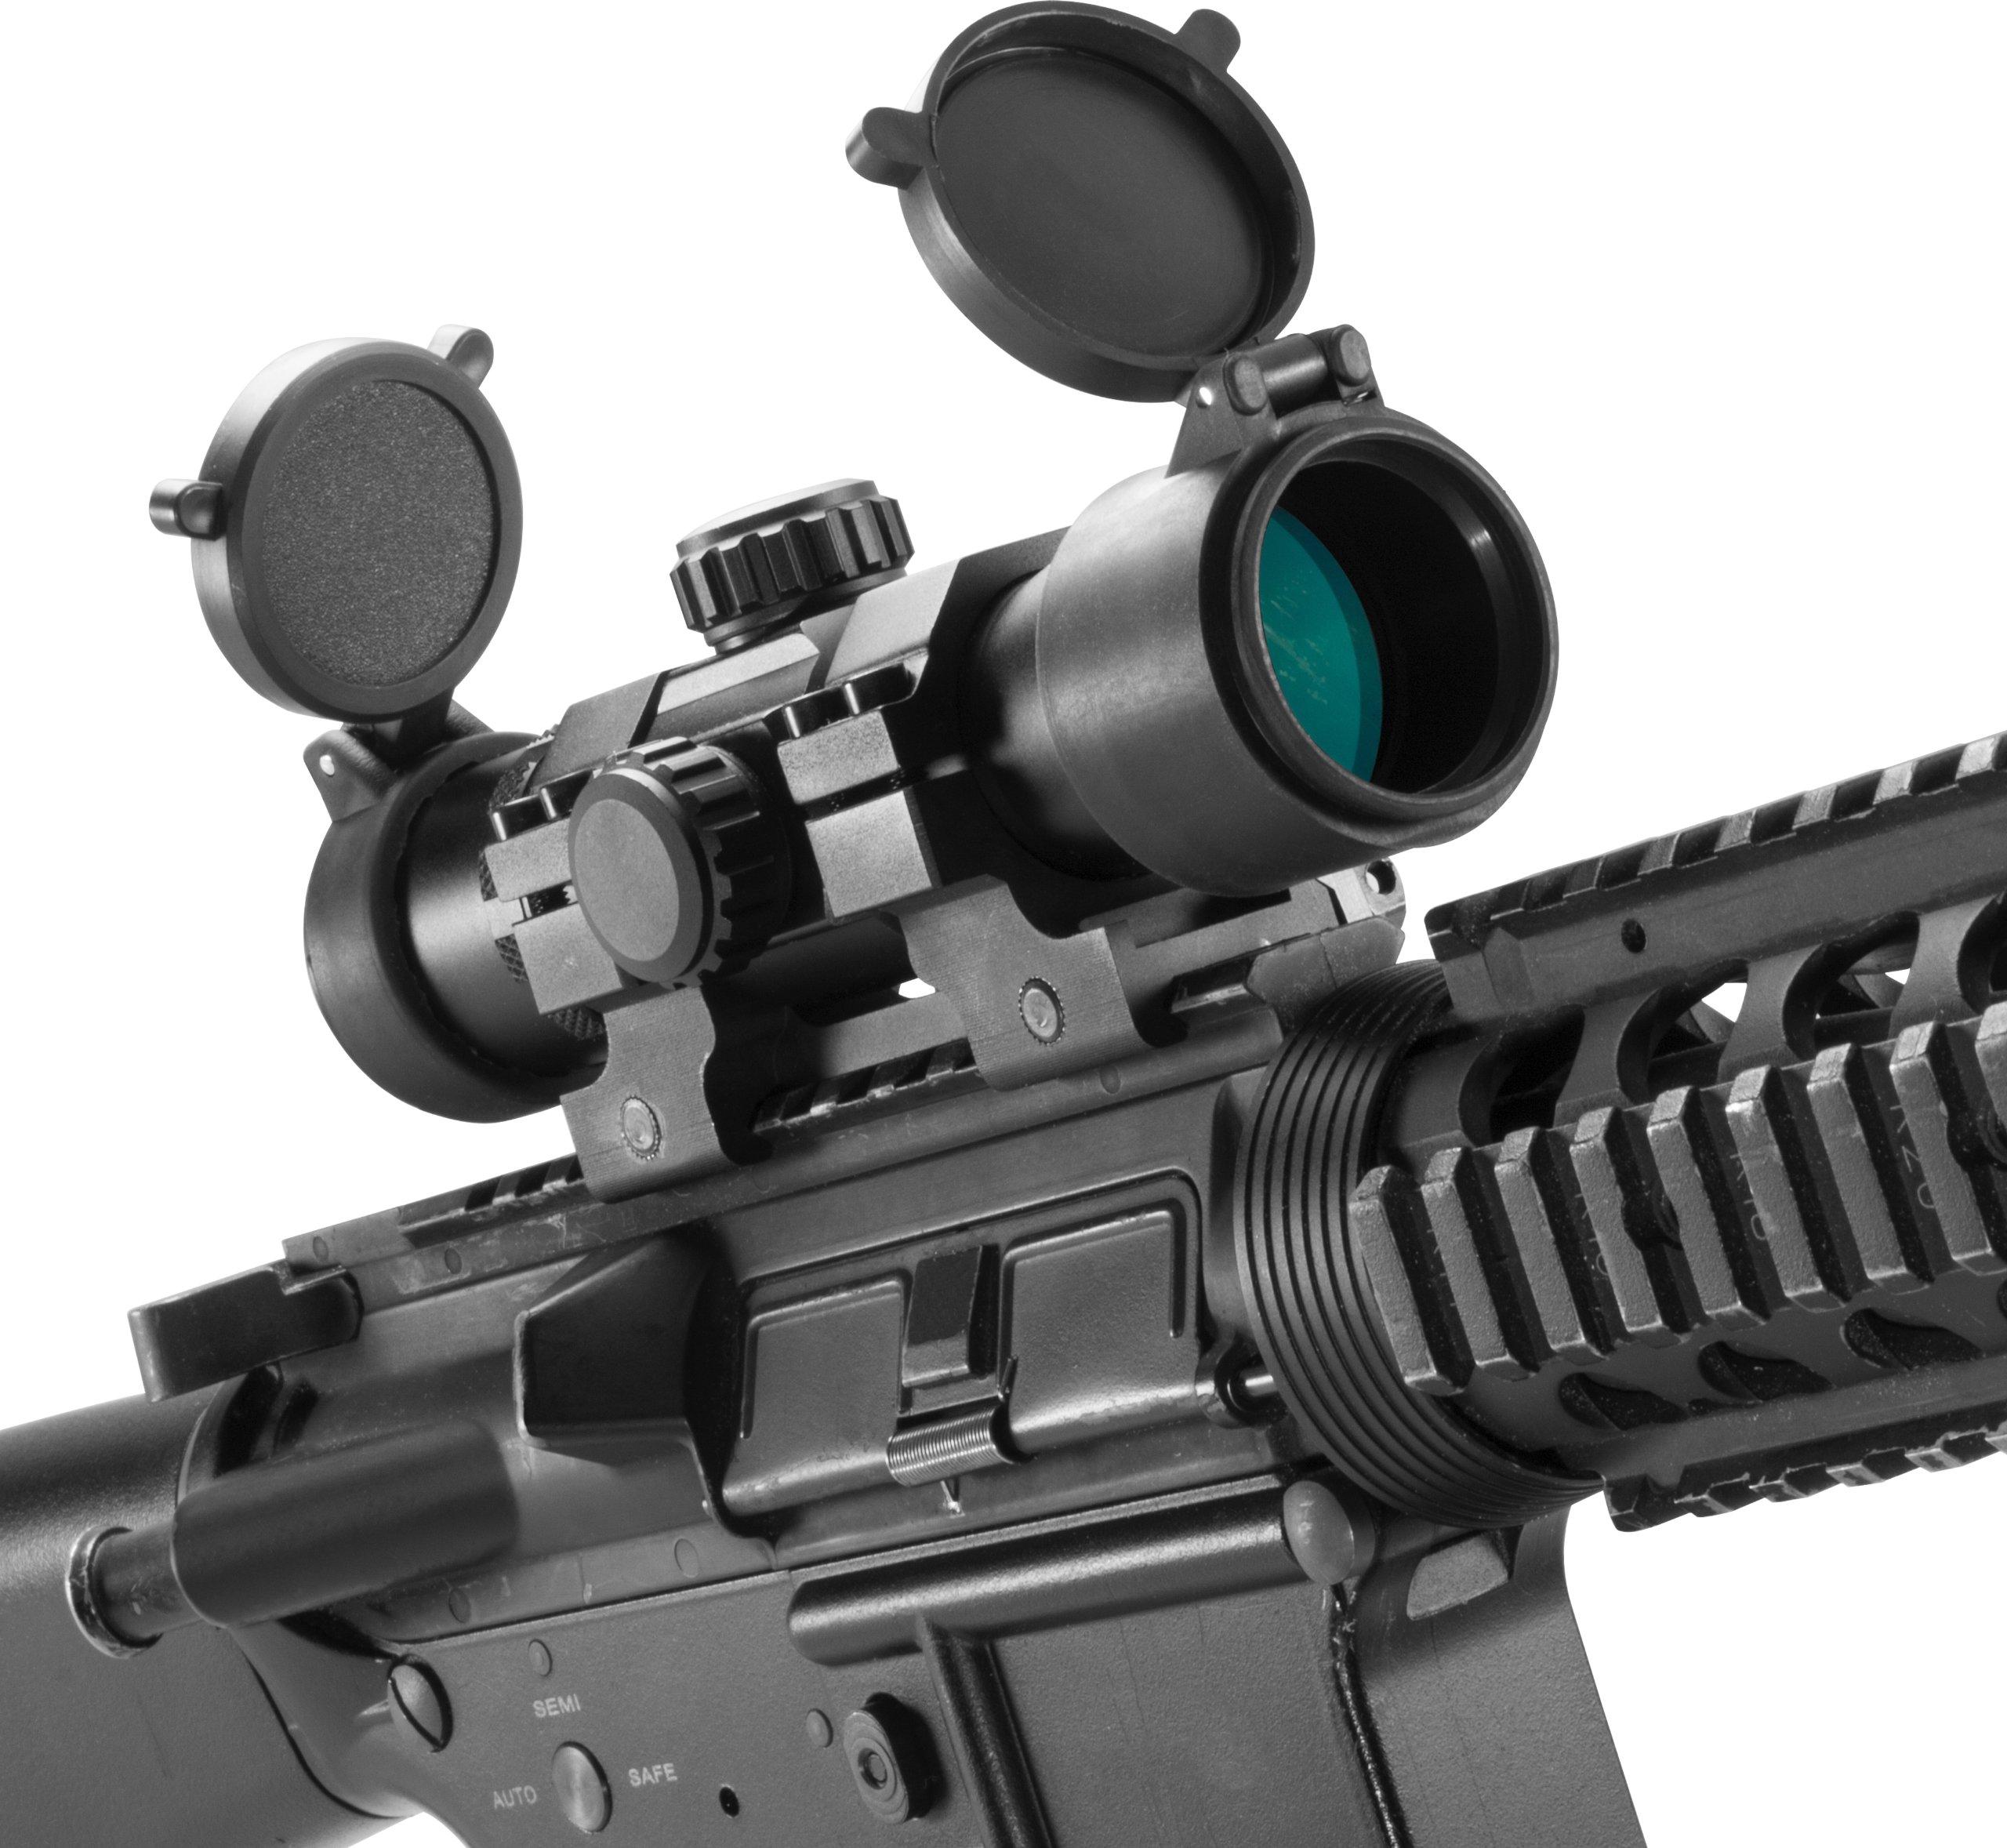 BARSKA New Rifle Scopes 1x30mm Dual Color Green/Red Dot Scope by BARSKA